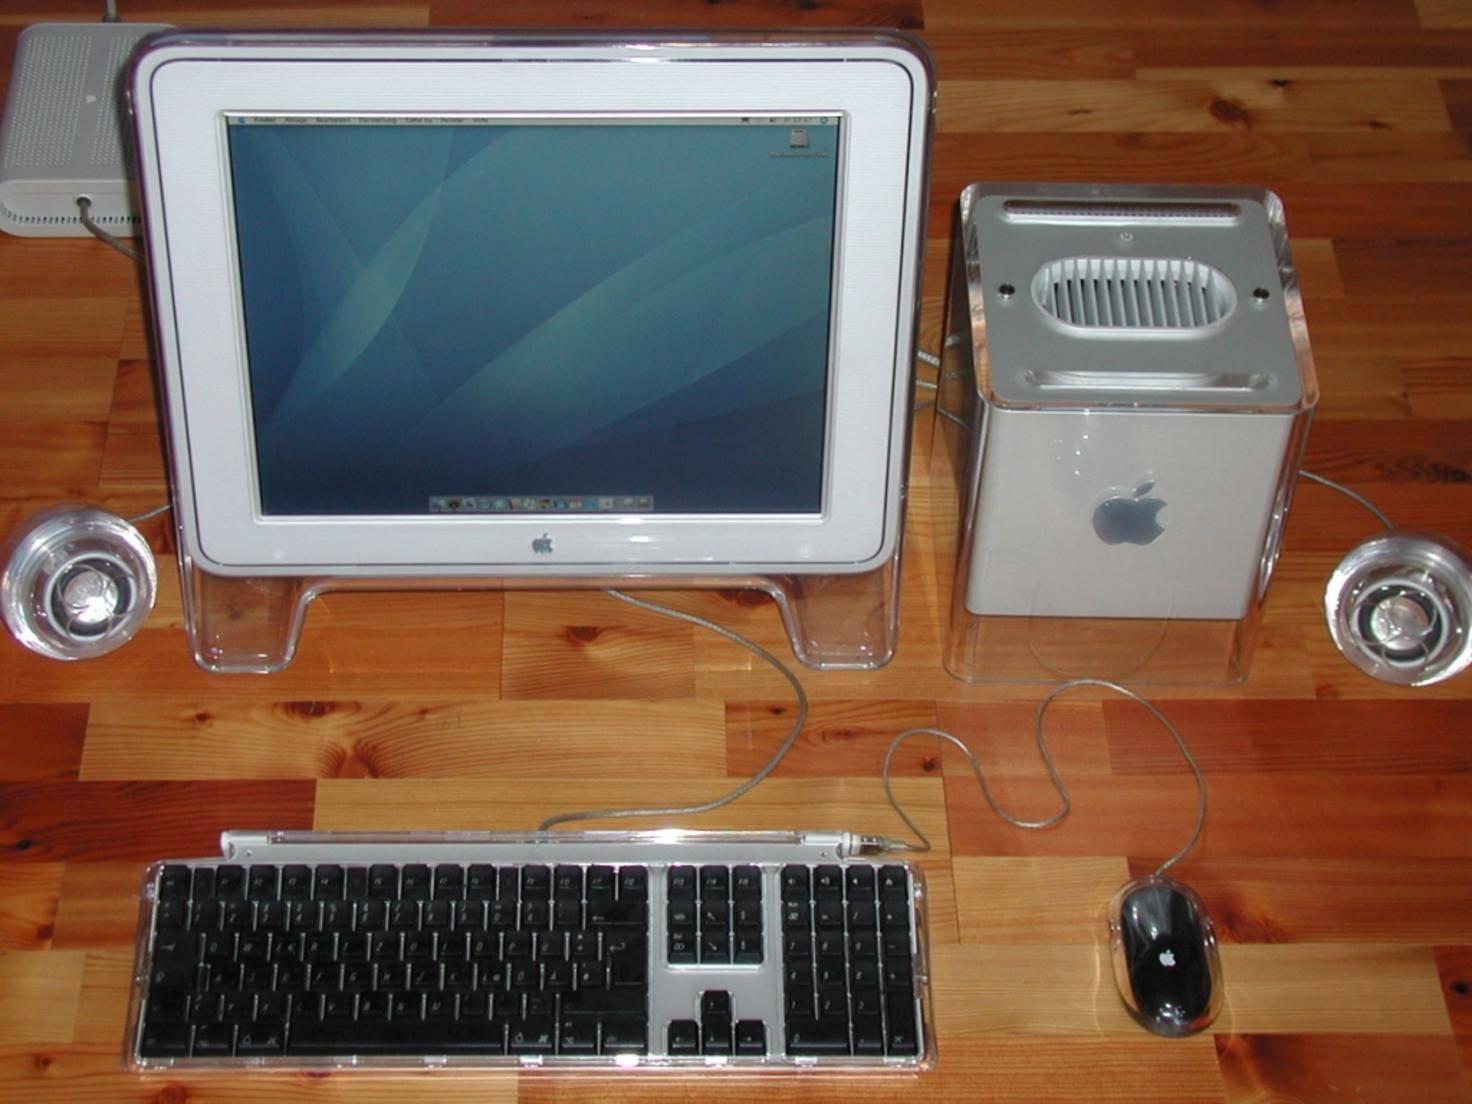 Apple Power Mac Cube